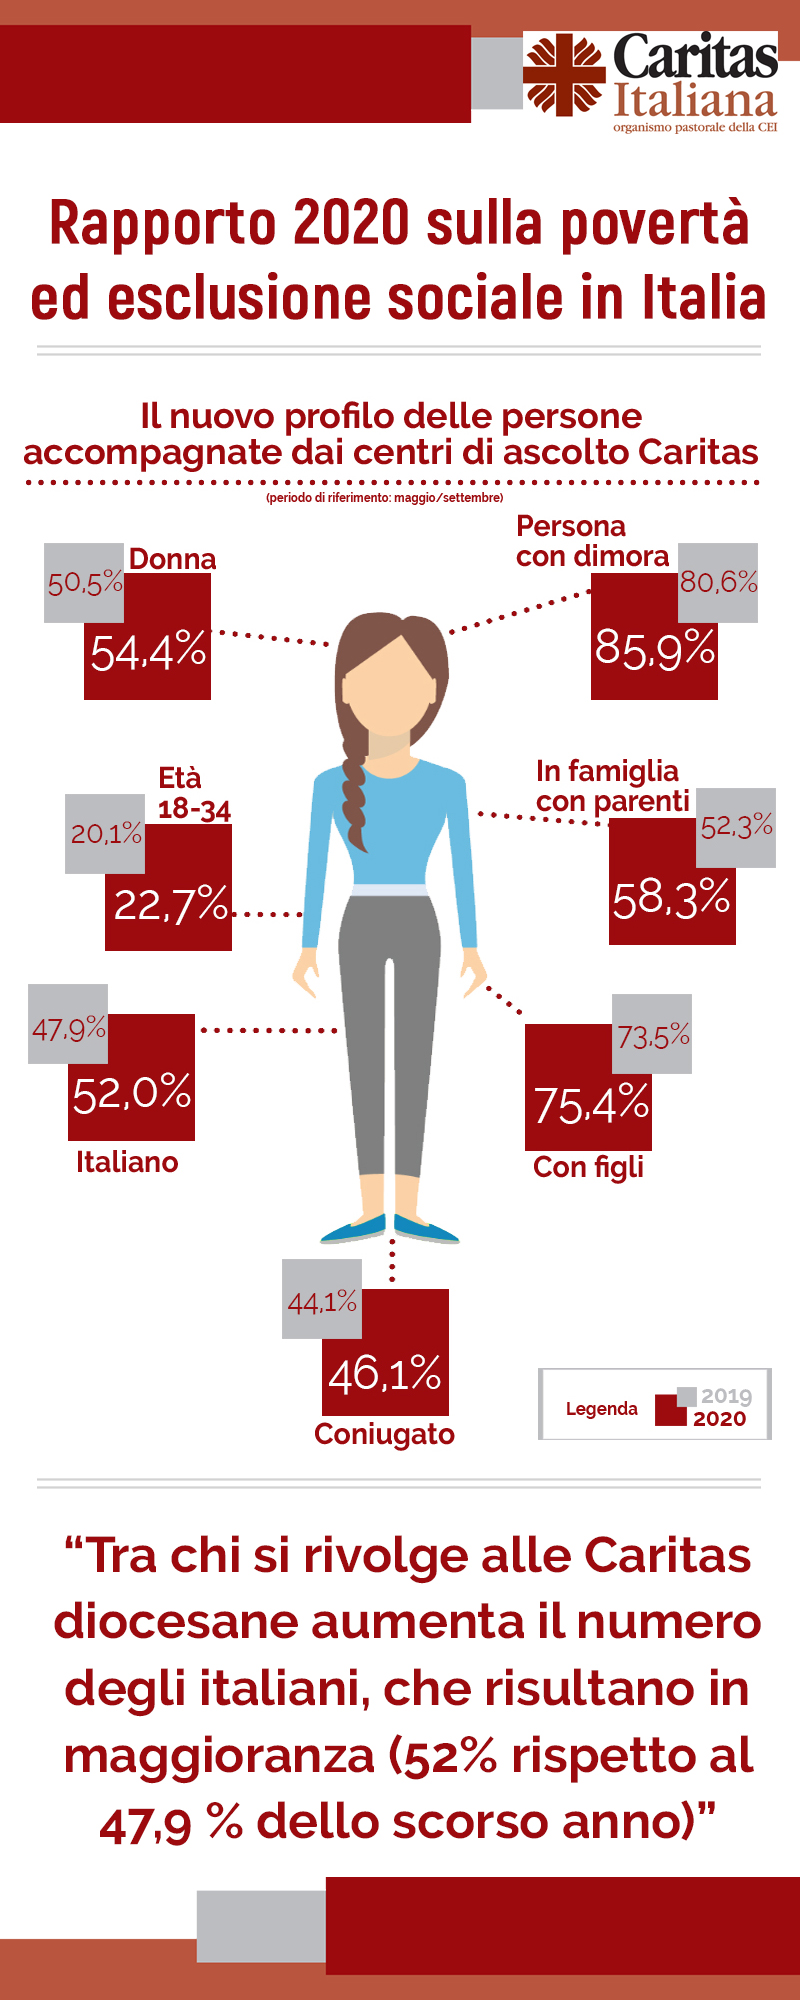 rapp-car-2-infografica_rapporto_caritas_2020_2_2